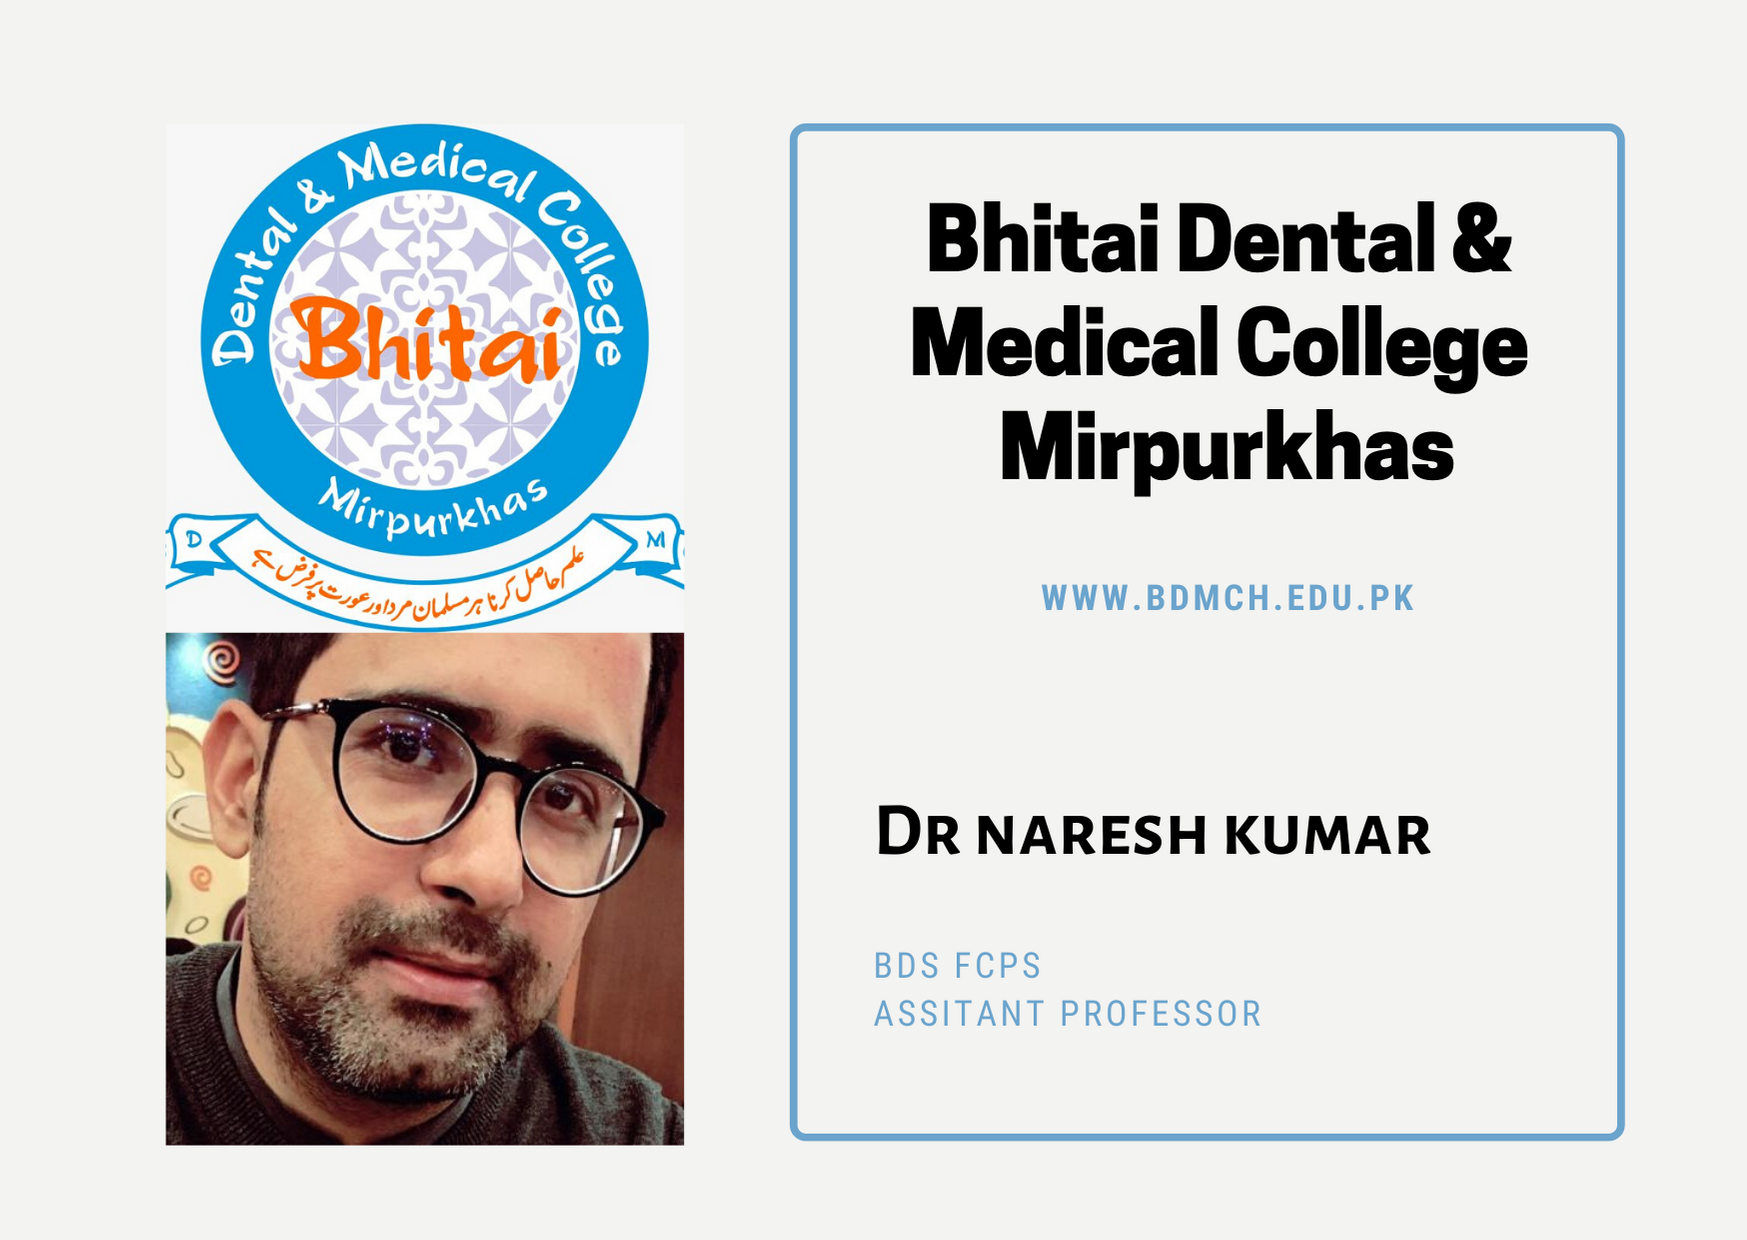 BHITAI DENTAL AND MEDICAL COLLEGE by DR NARESH KUMAR